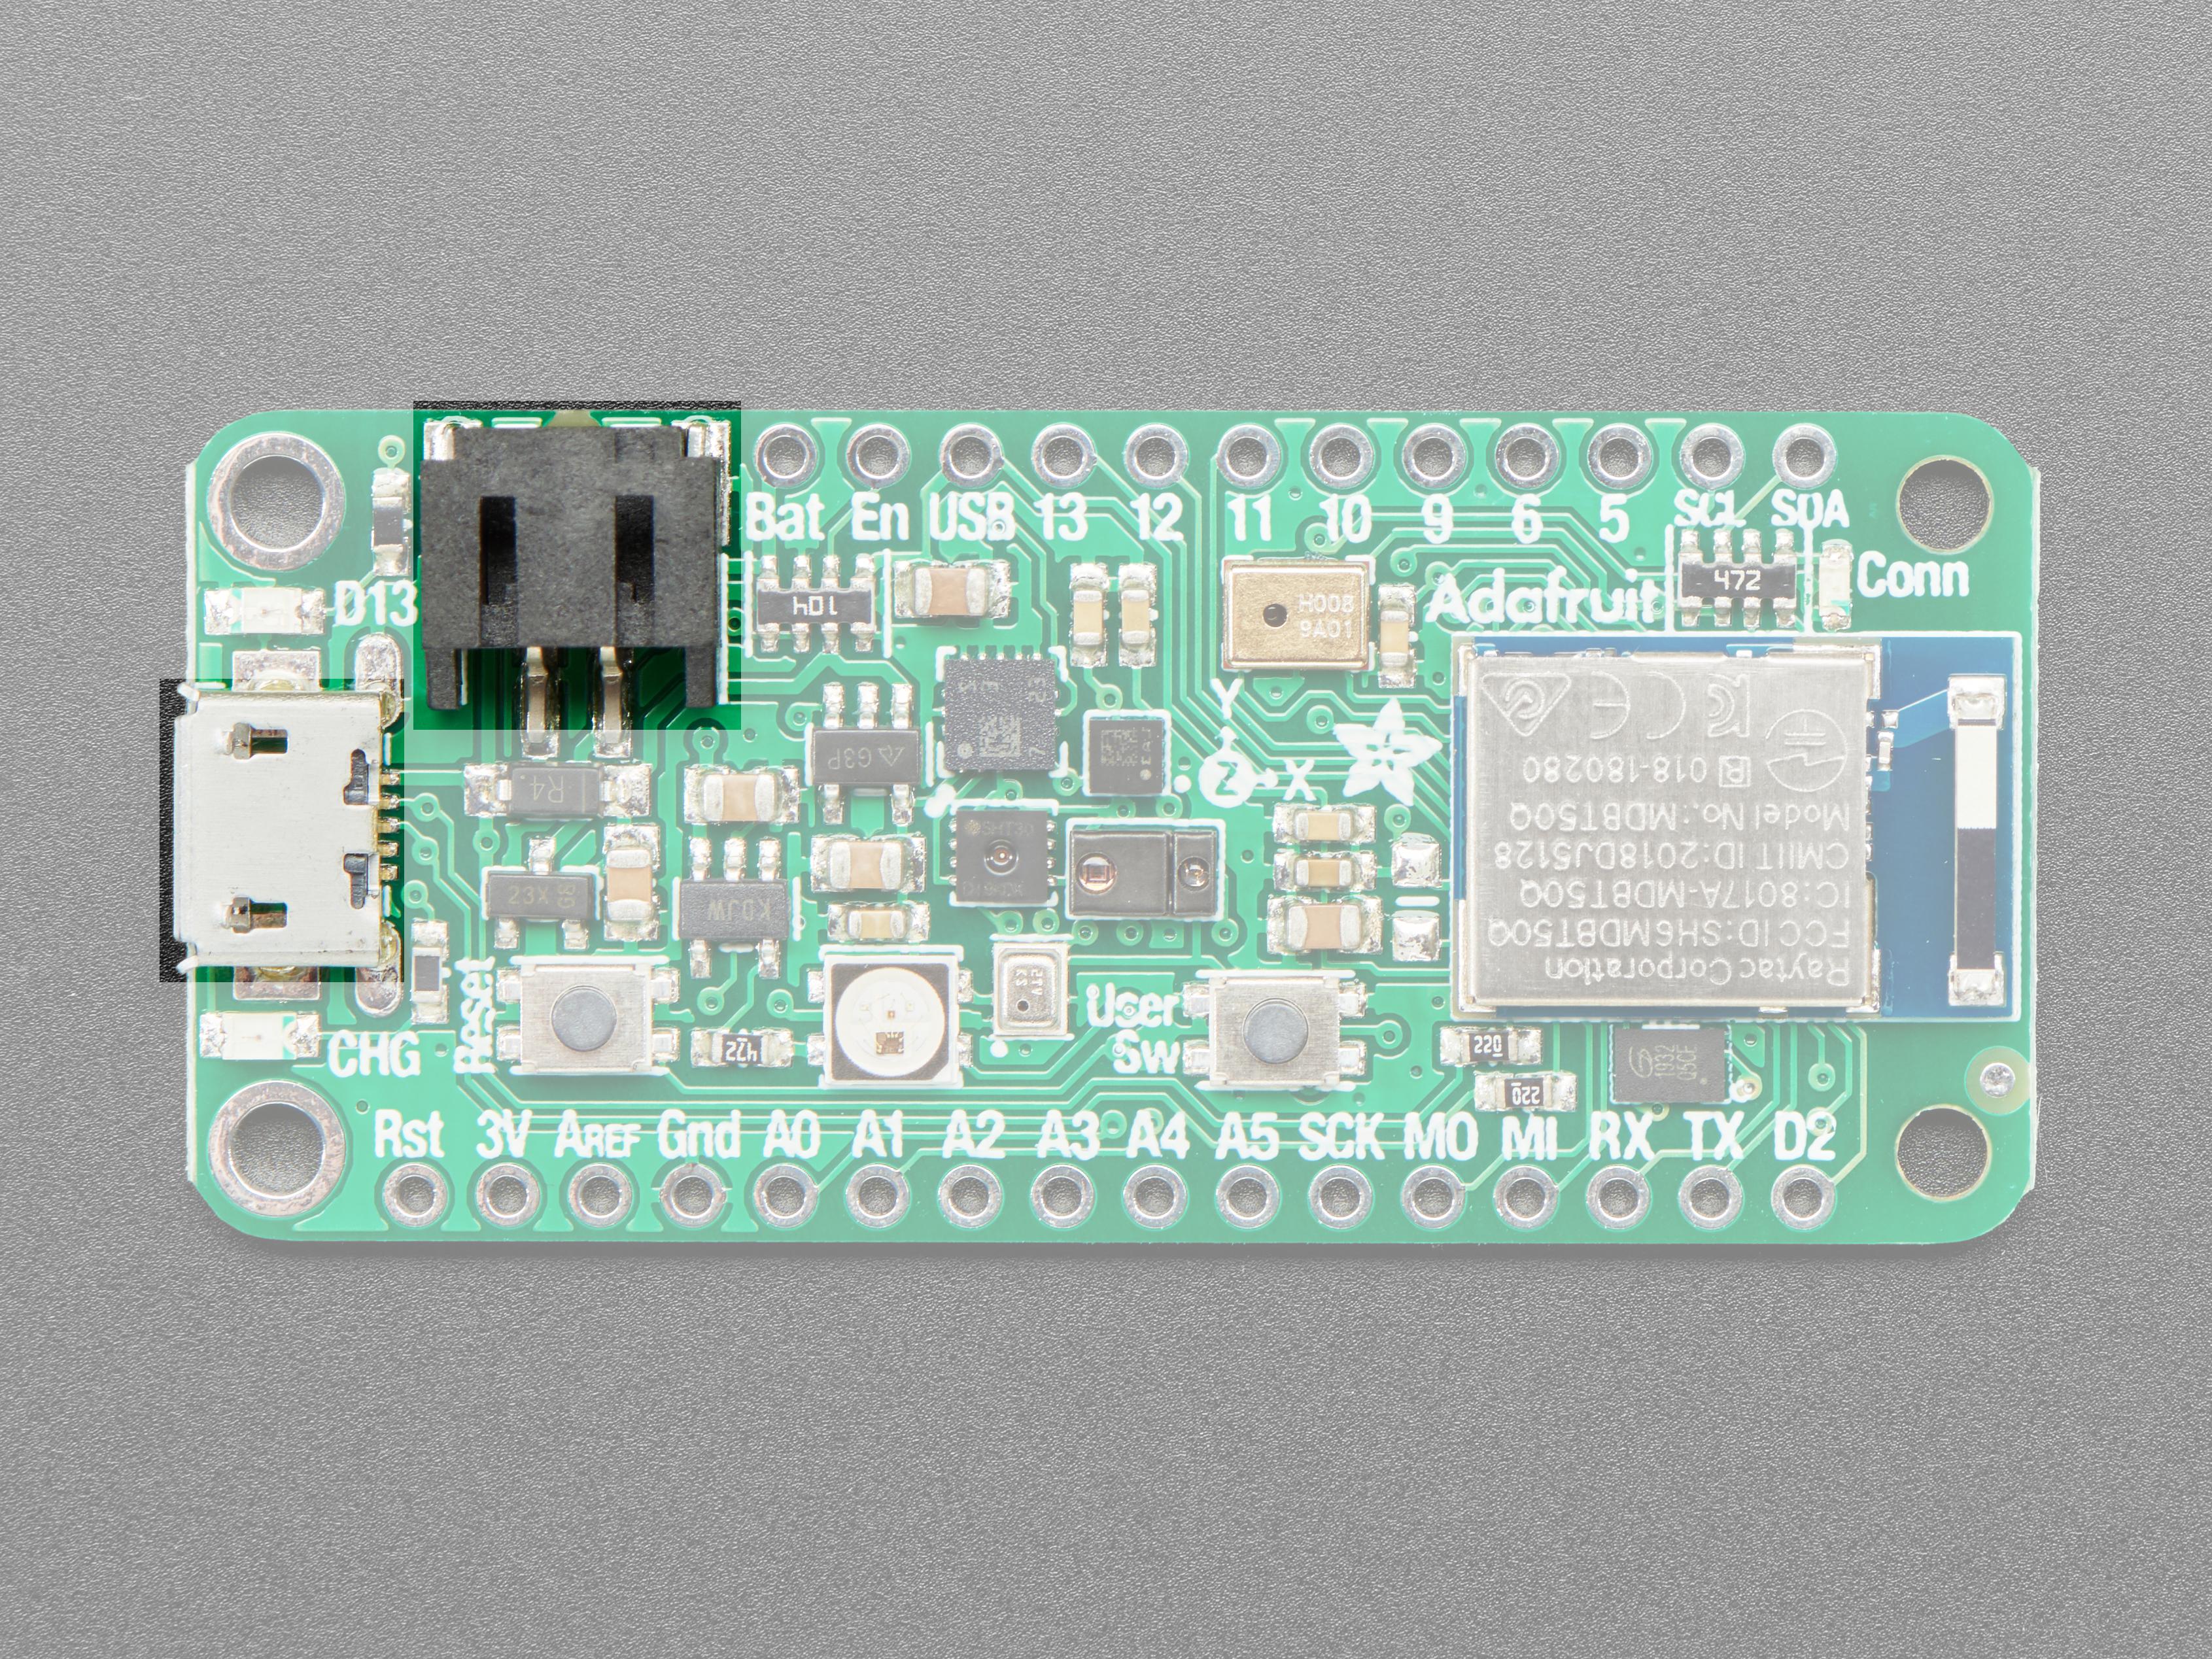 sensors_Feather_Sense_pinouts_USB_battery.png